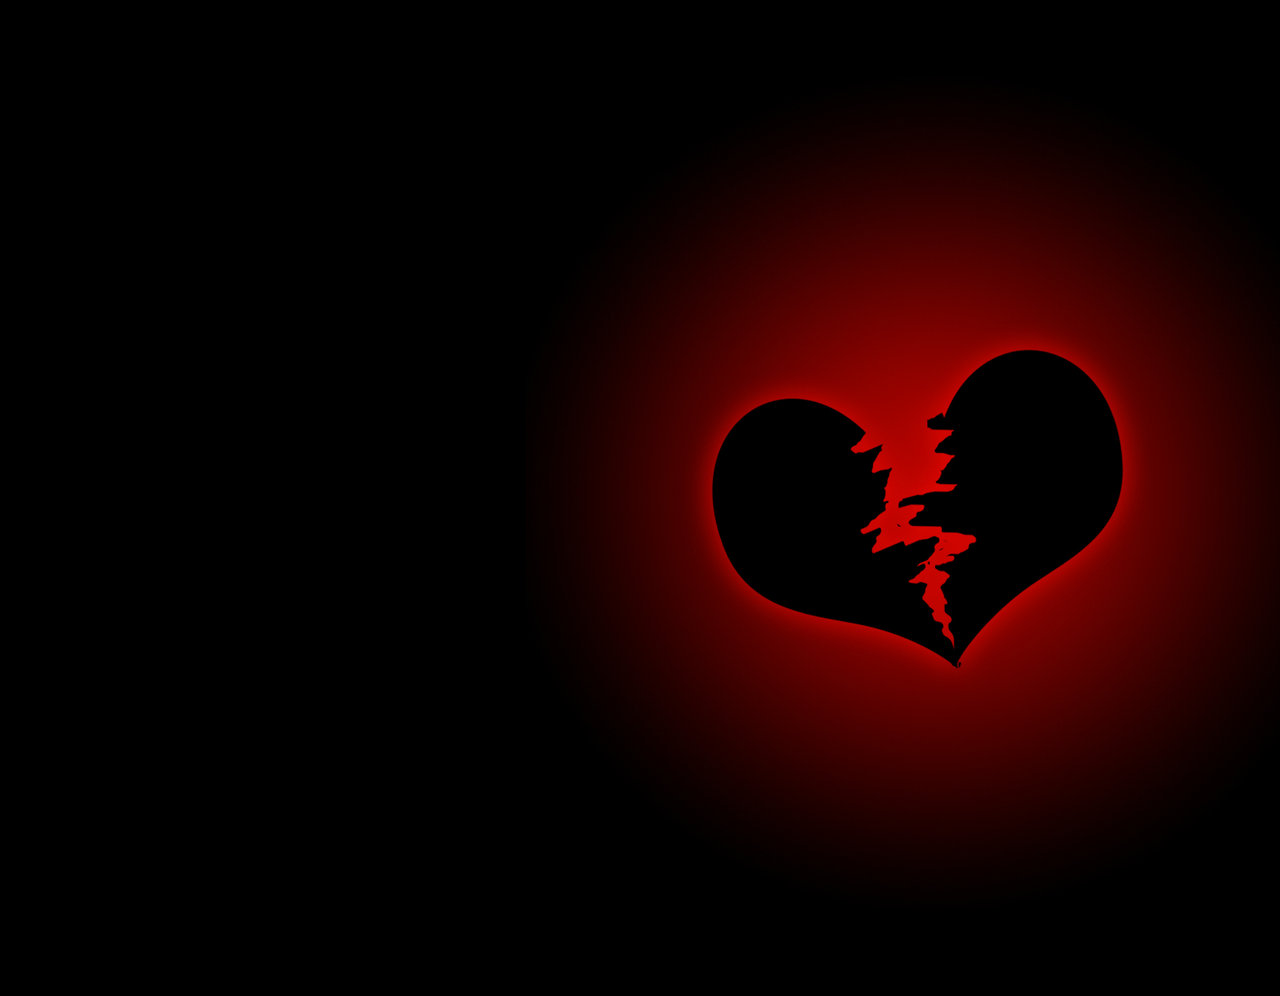 broken-heart-even-shines-with-love-wallpaper